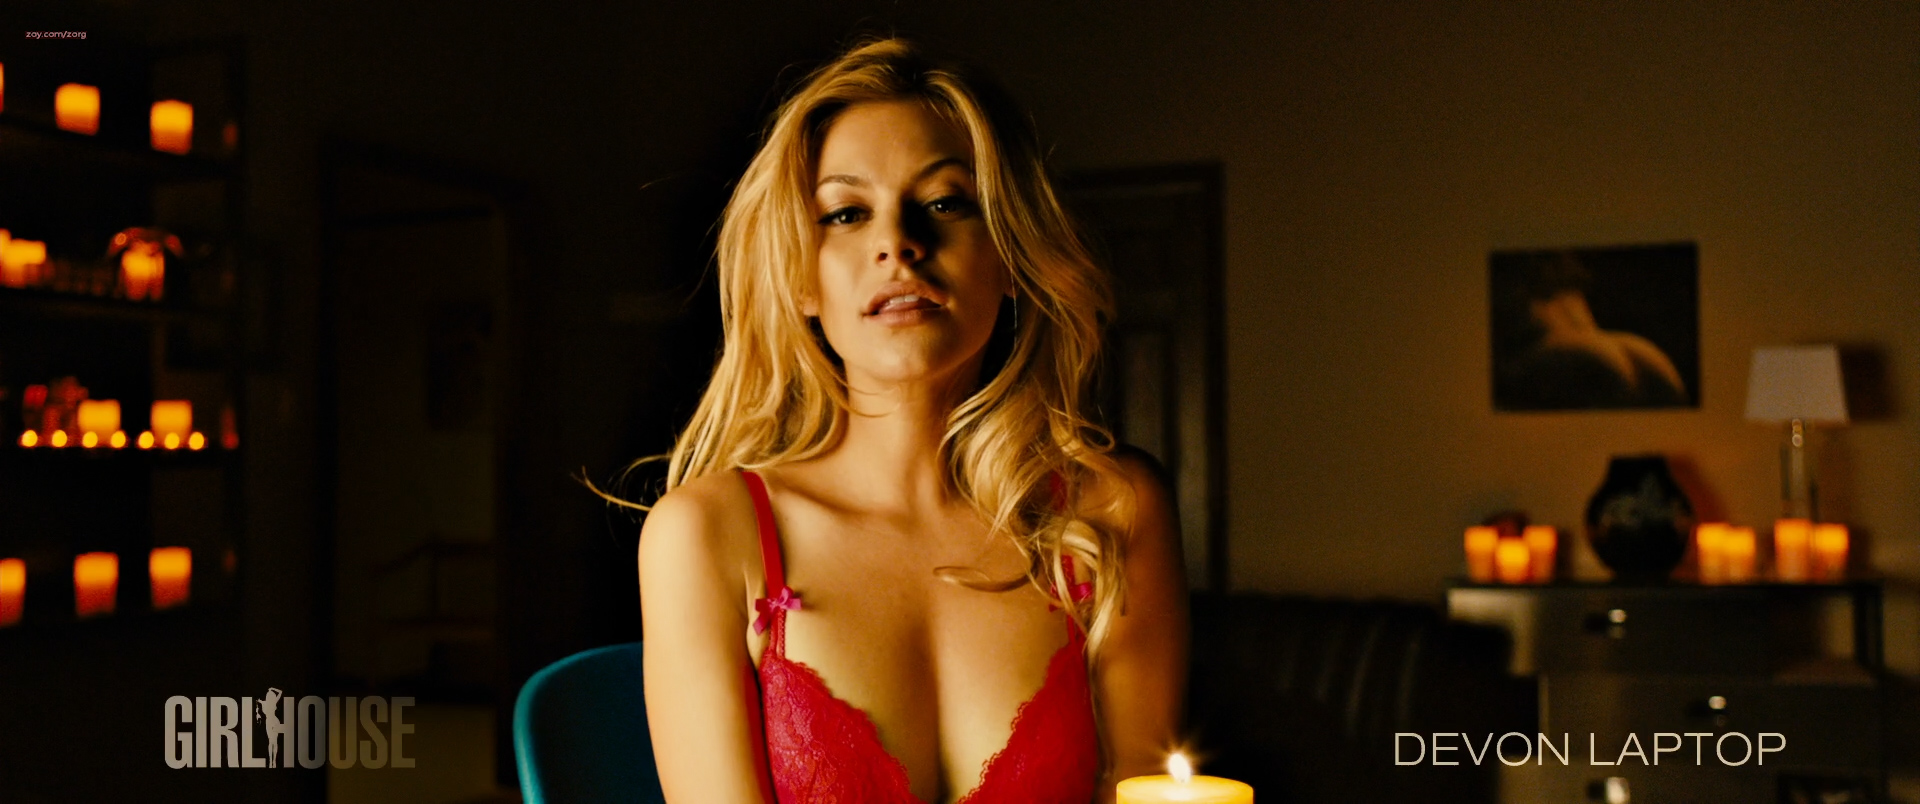 Alyson Bath hot and sexy - Girlhouse (2014) HD 1080p Web-Dl (10)